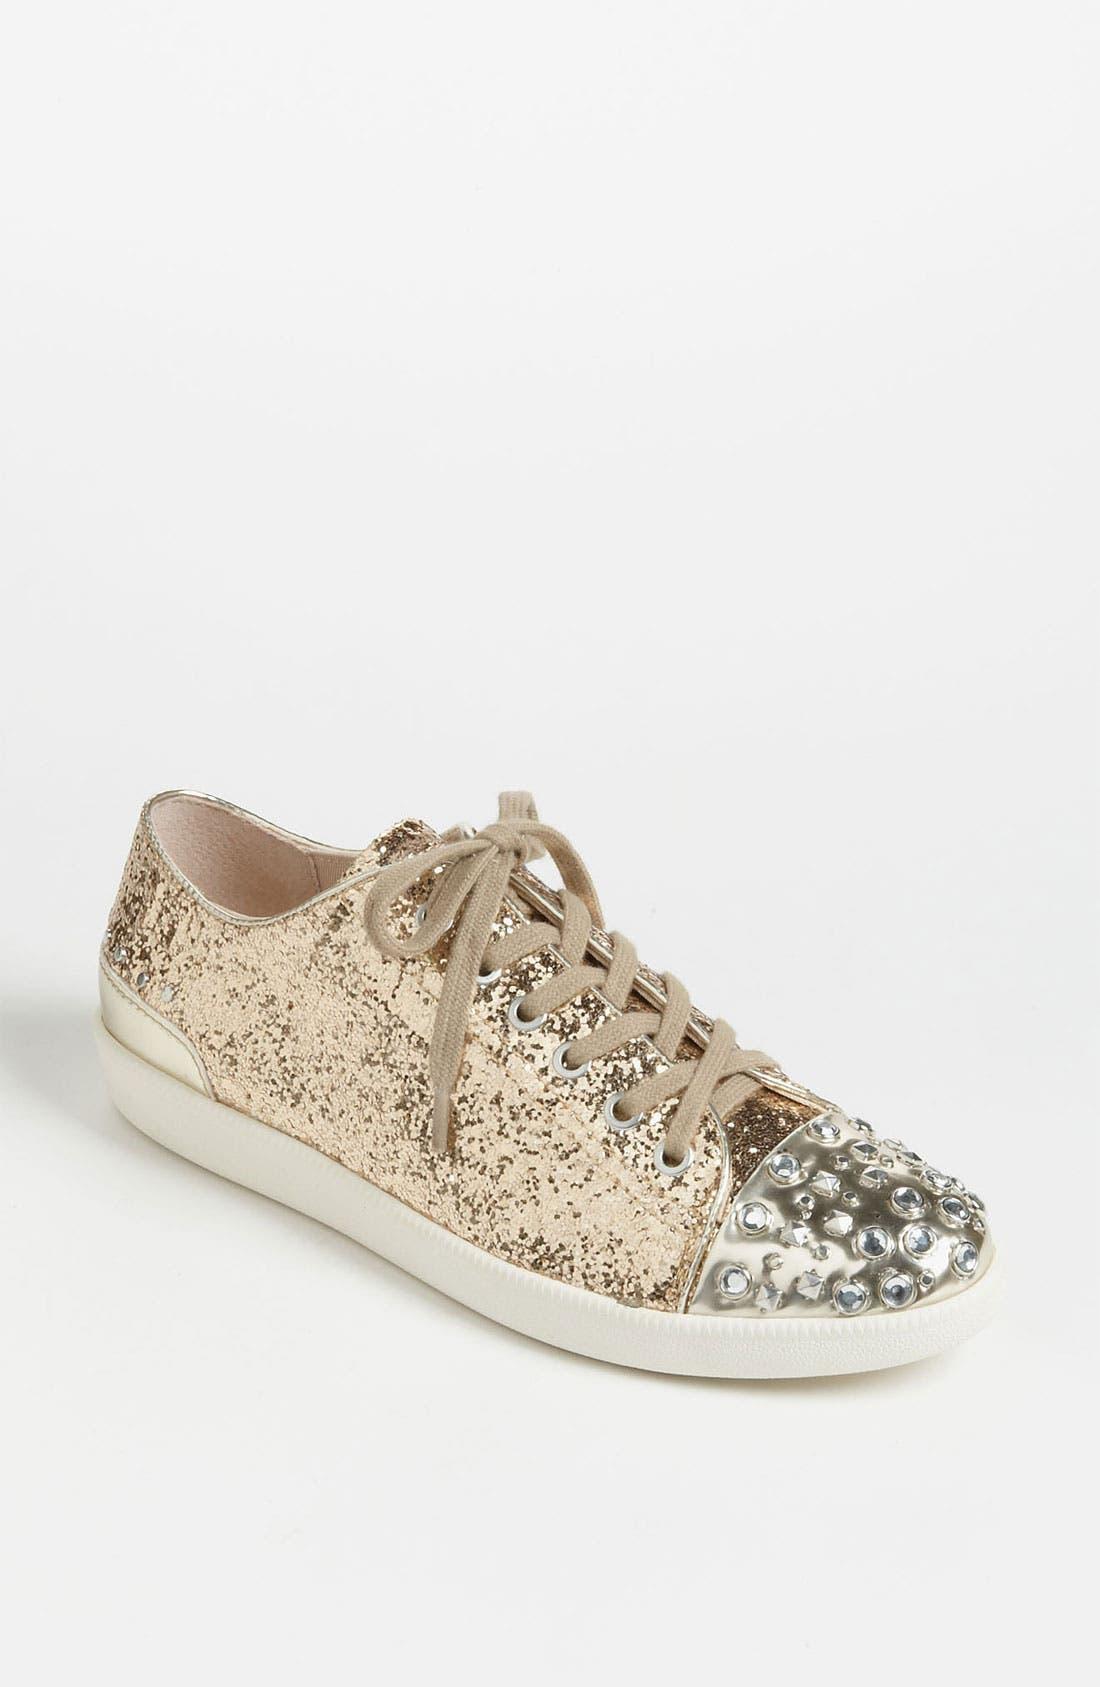 Main Image - Boutique 9 'Katelyn' Sneaker